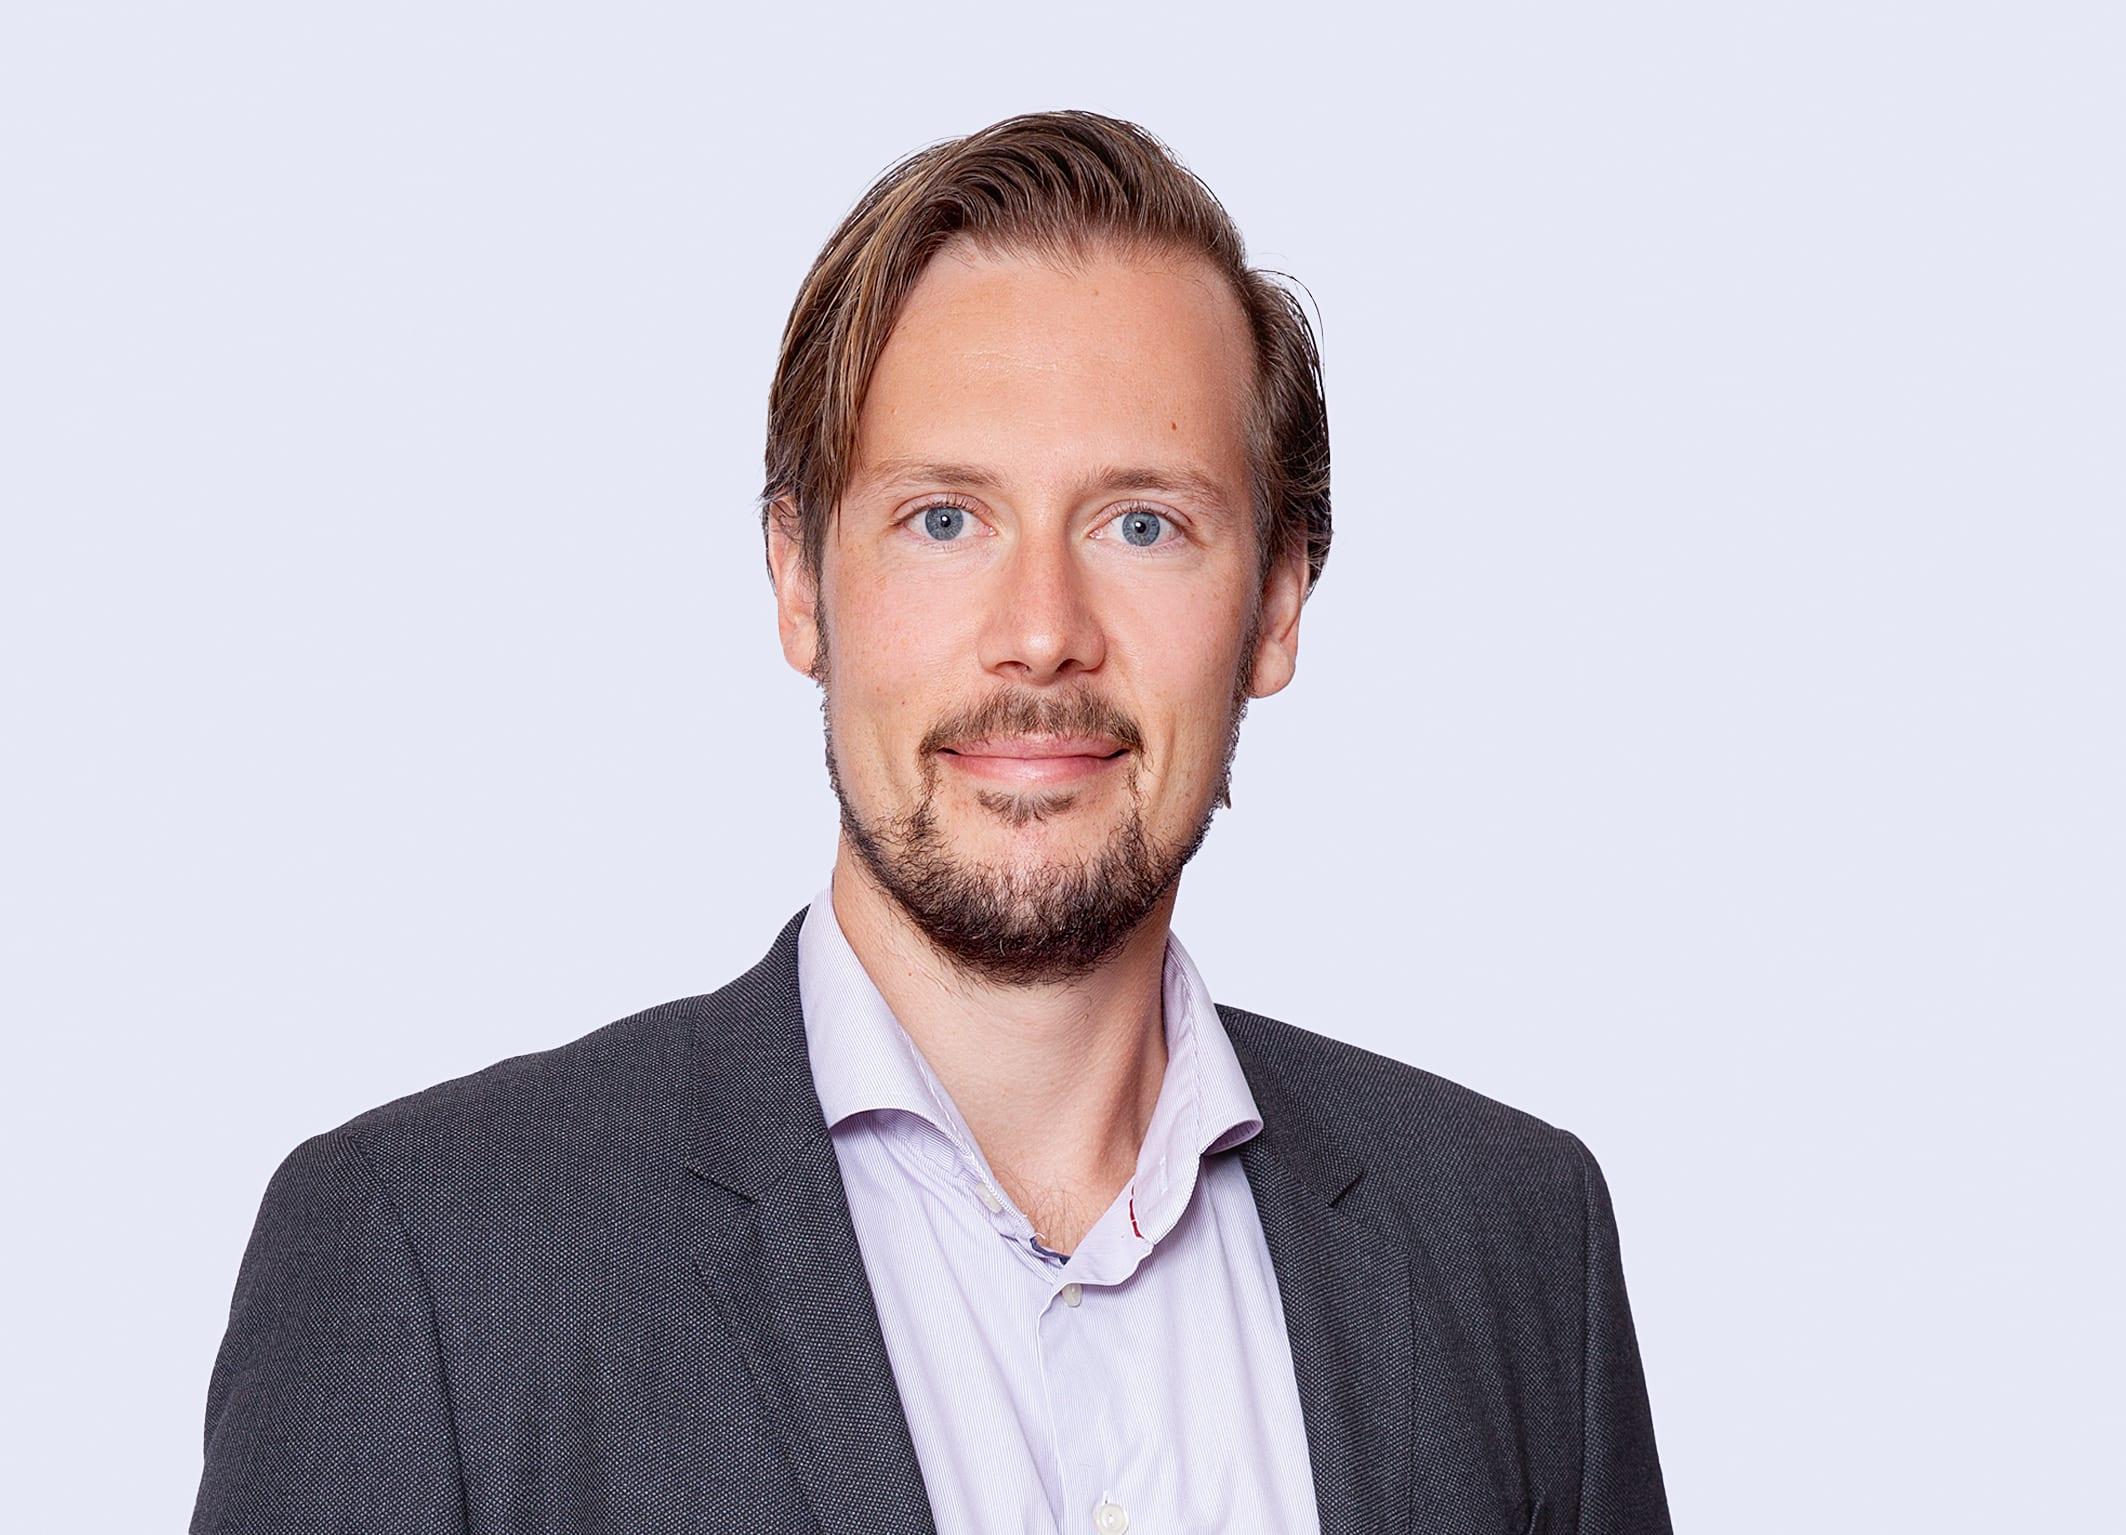 Martin Sommerseth Jaer